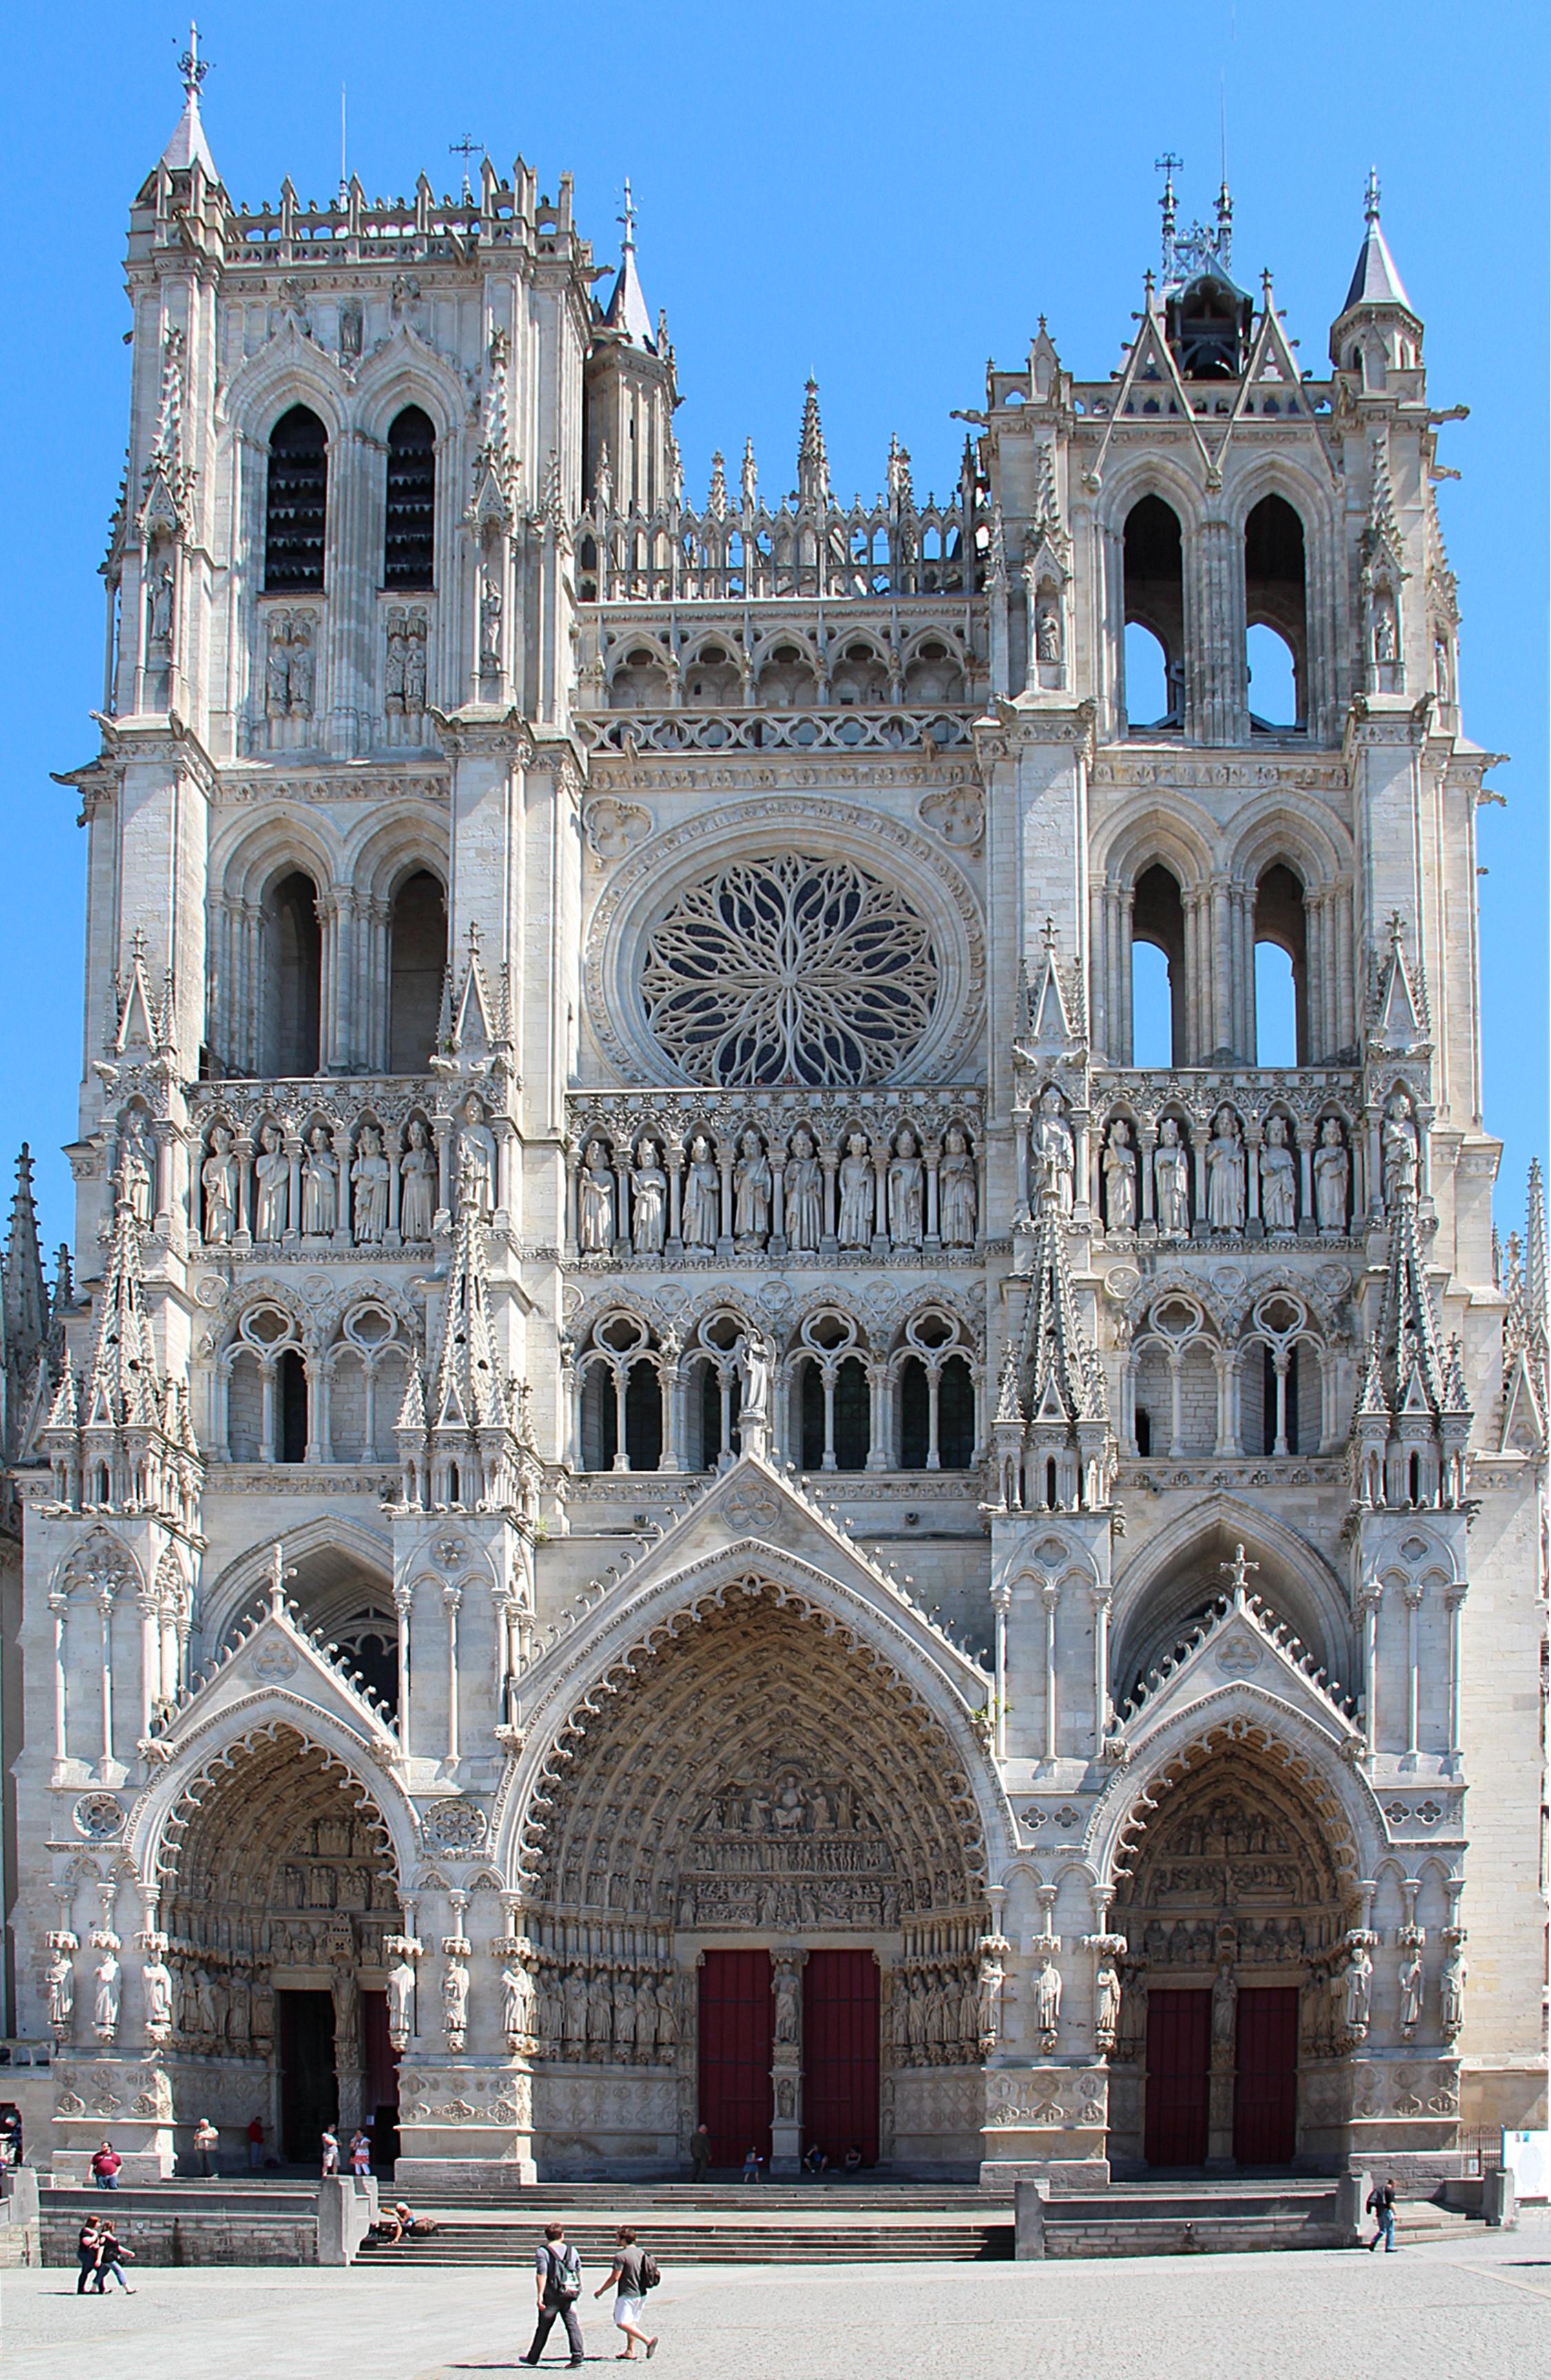 Depiction of Catedral de Amiens